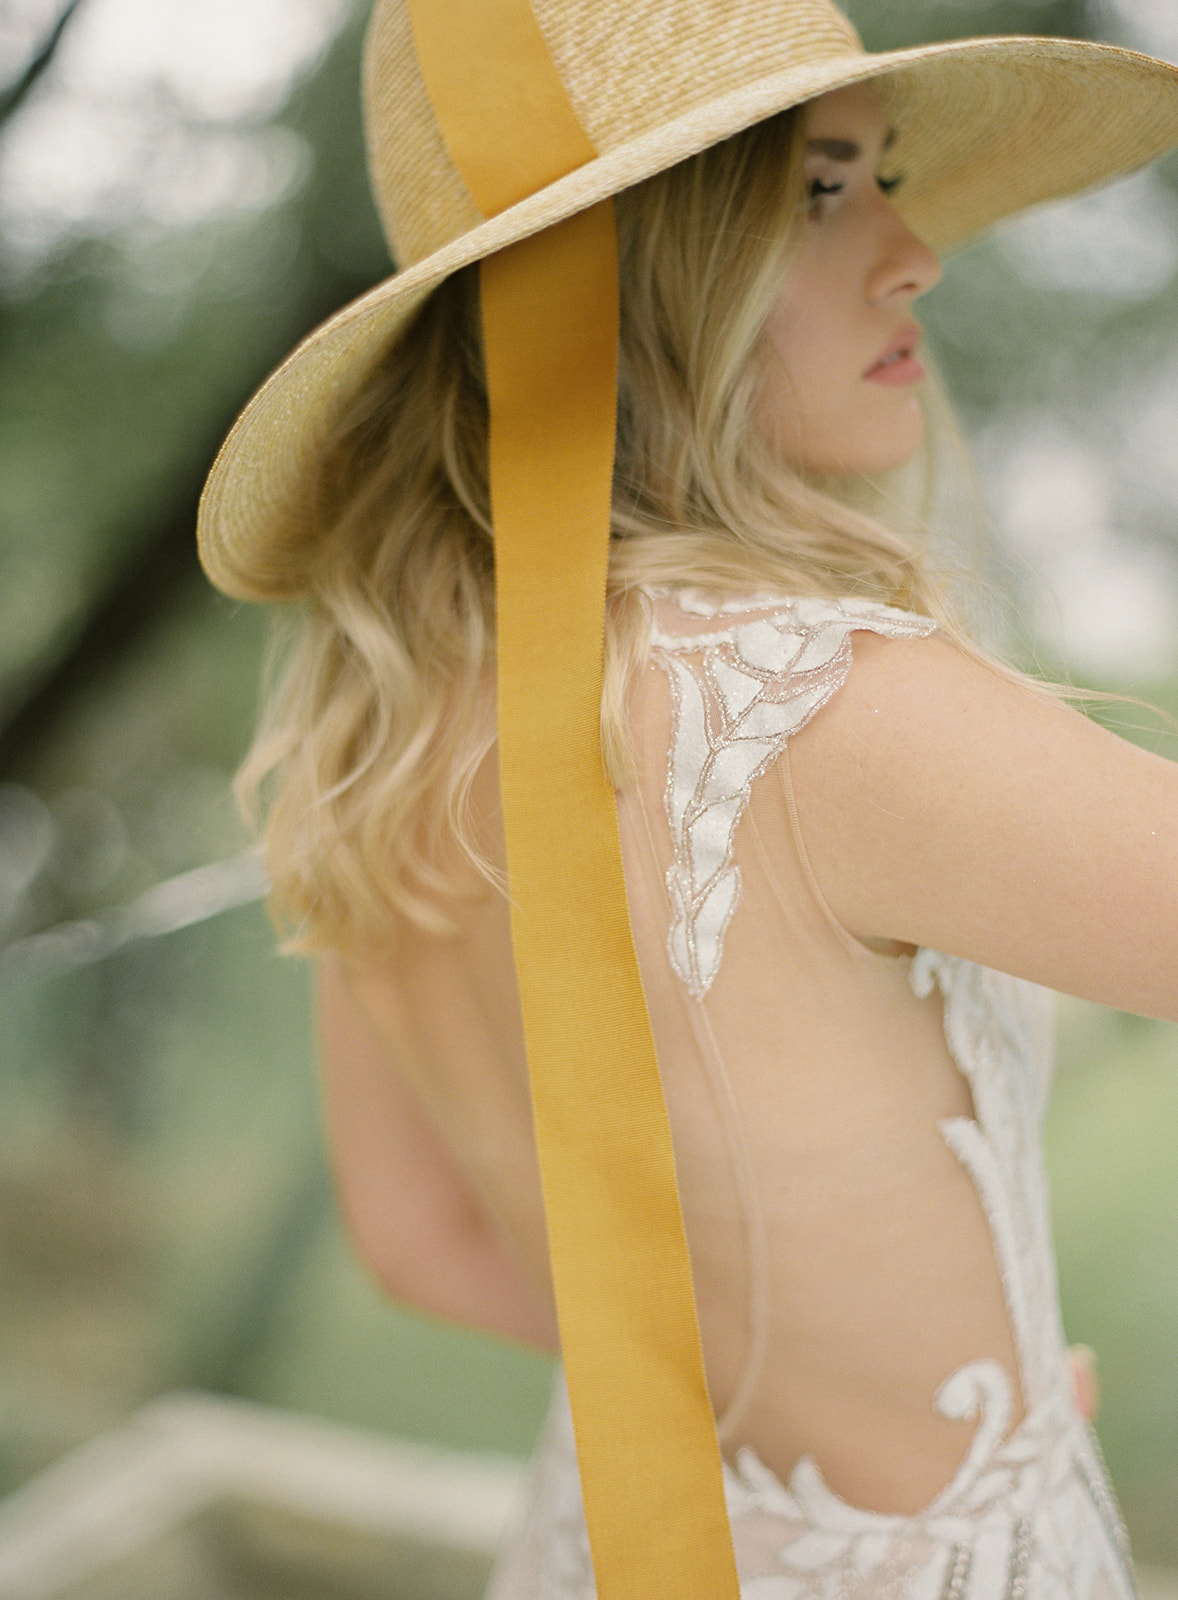 Austin_Editorial-Carrie_King_Photographer-71.jpg